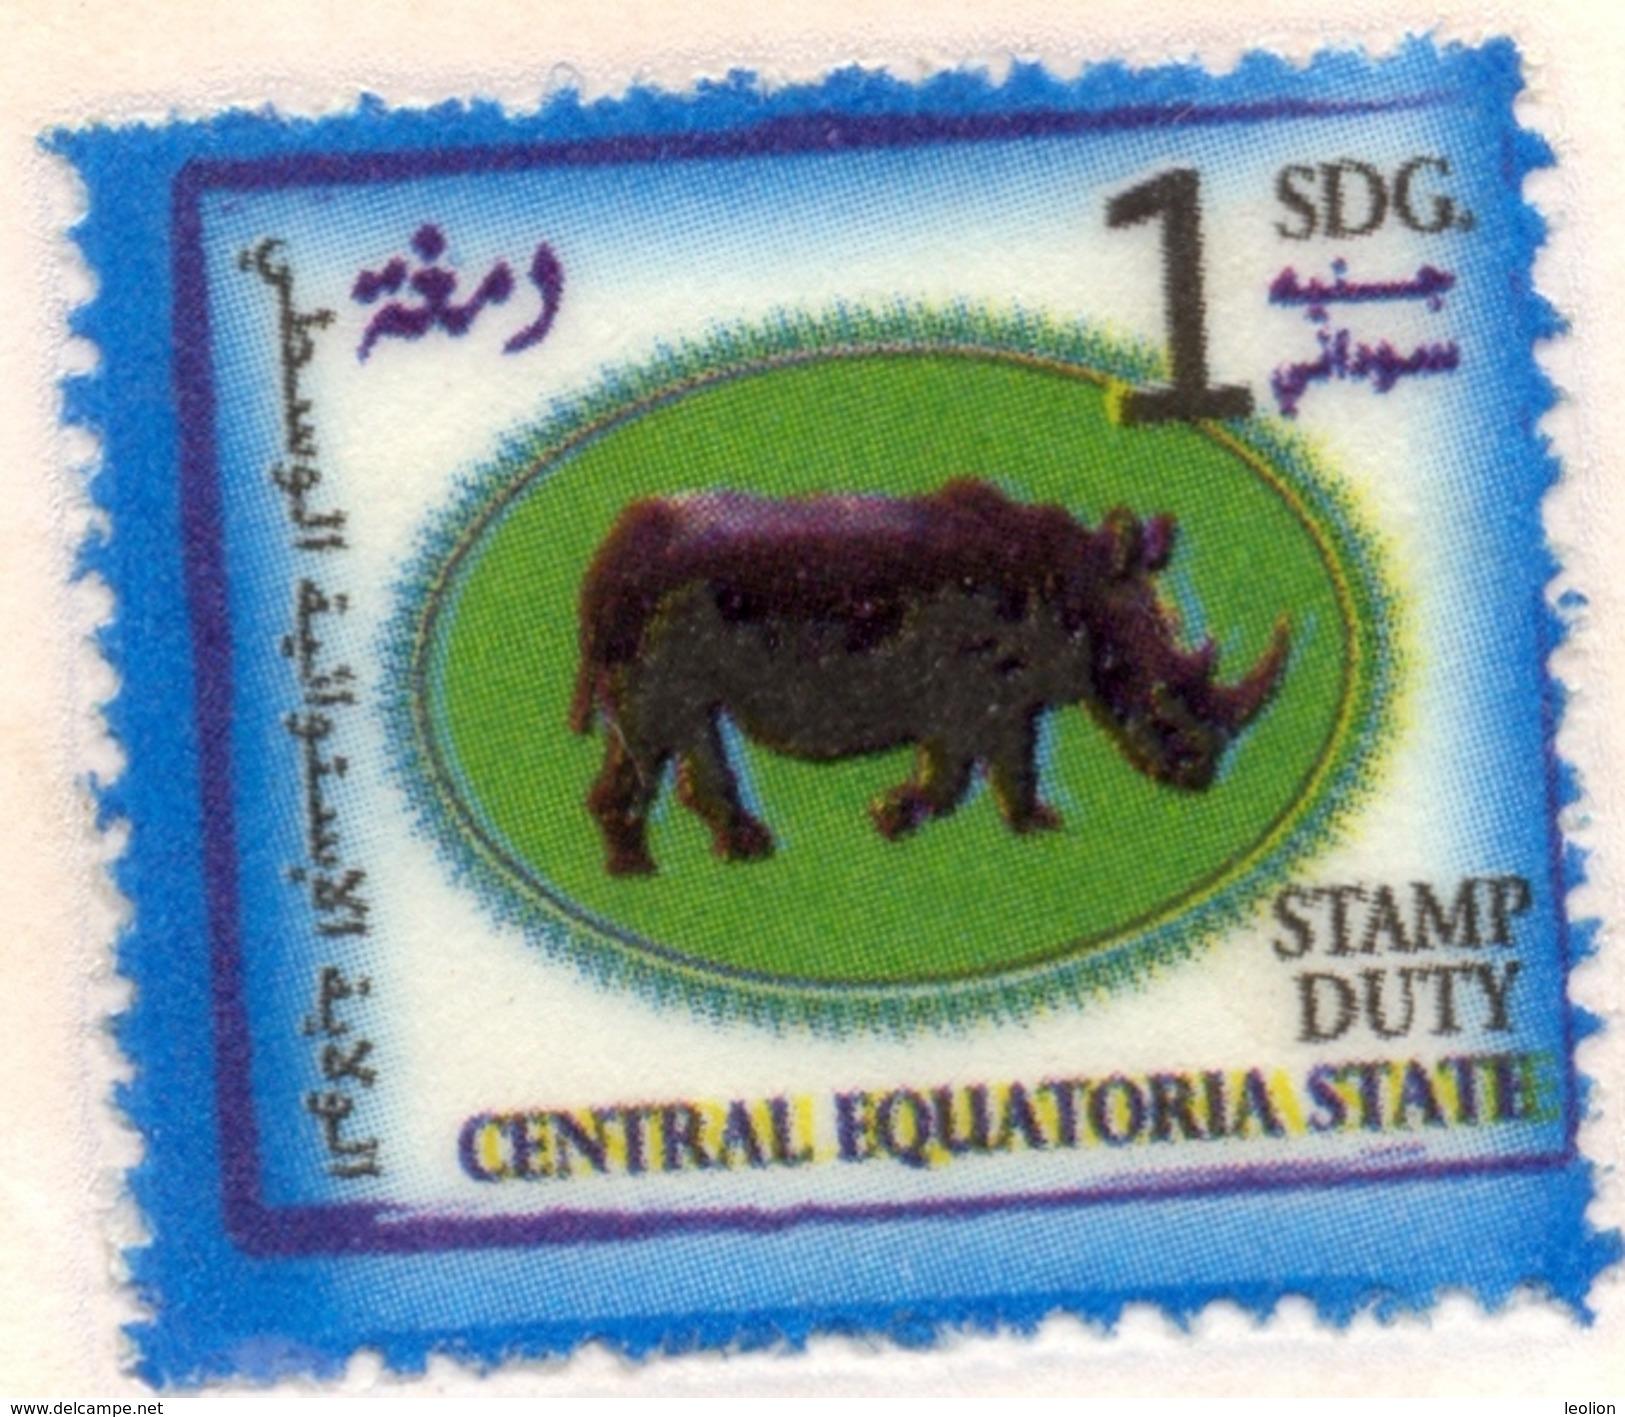 SOUTH SUDAN Südsudan 1 SDG Revenue / Fiscal Stamp Central Equatoria State RHINO Timbres Fiscaux Soudan Du Sud RARE! - South Sudan